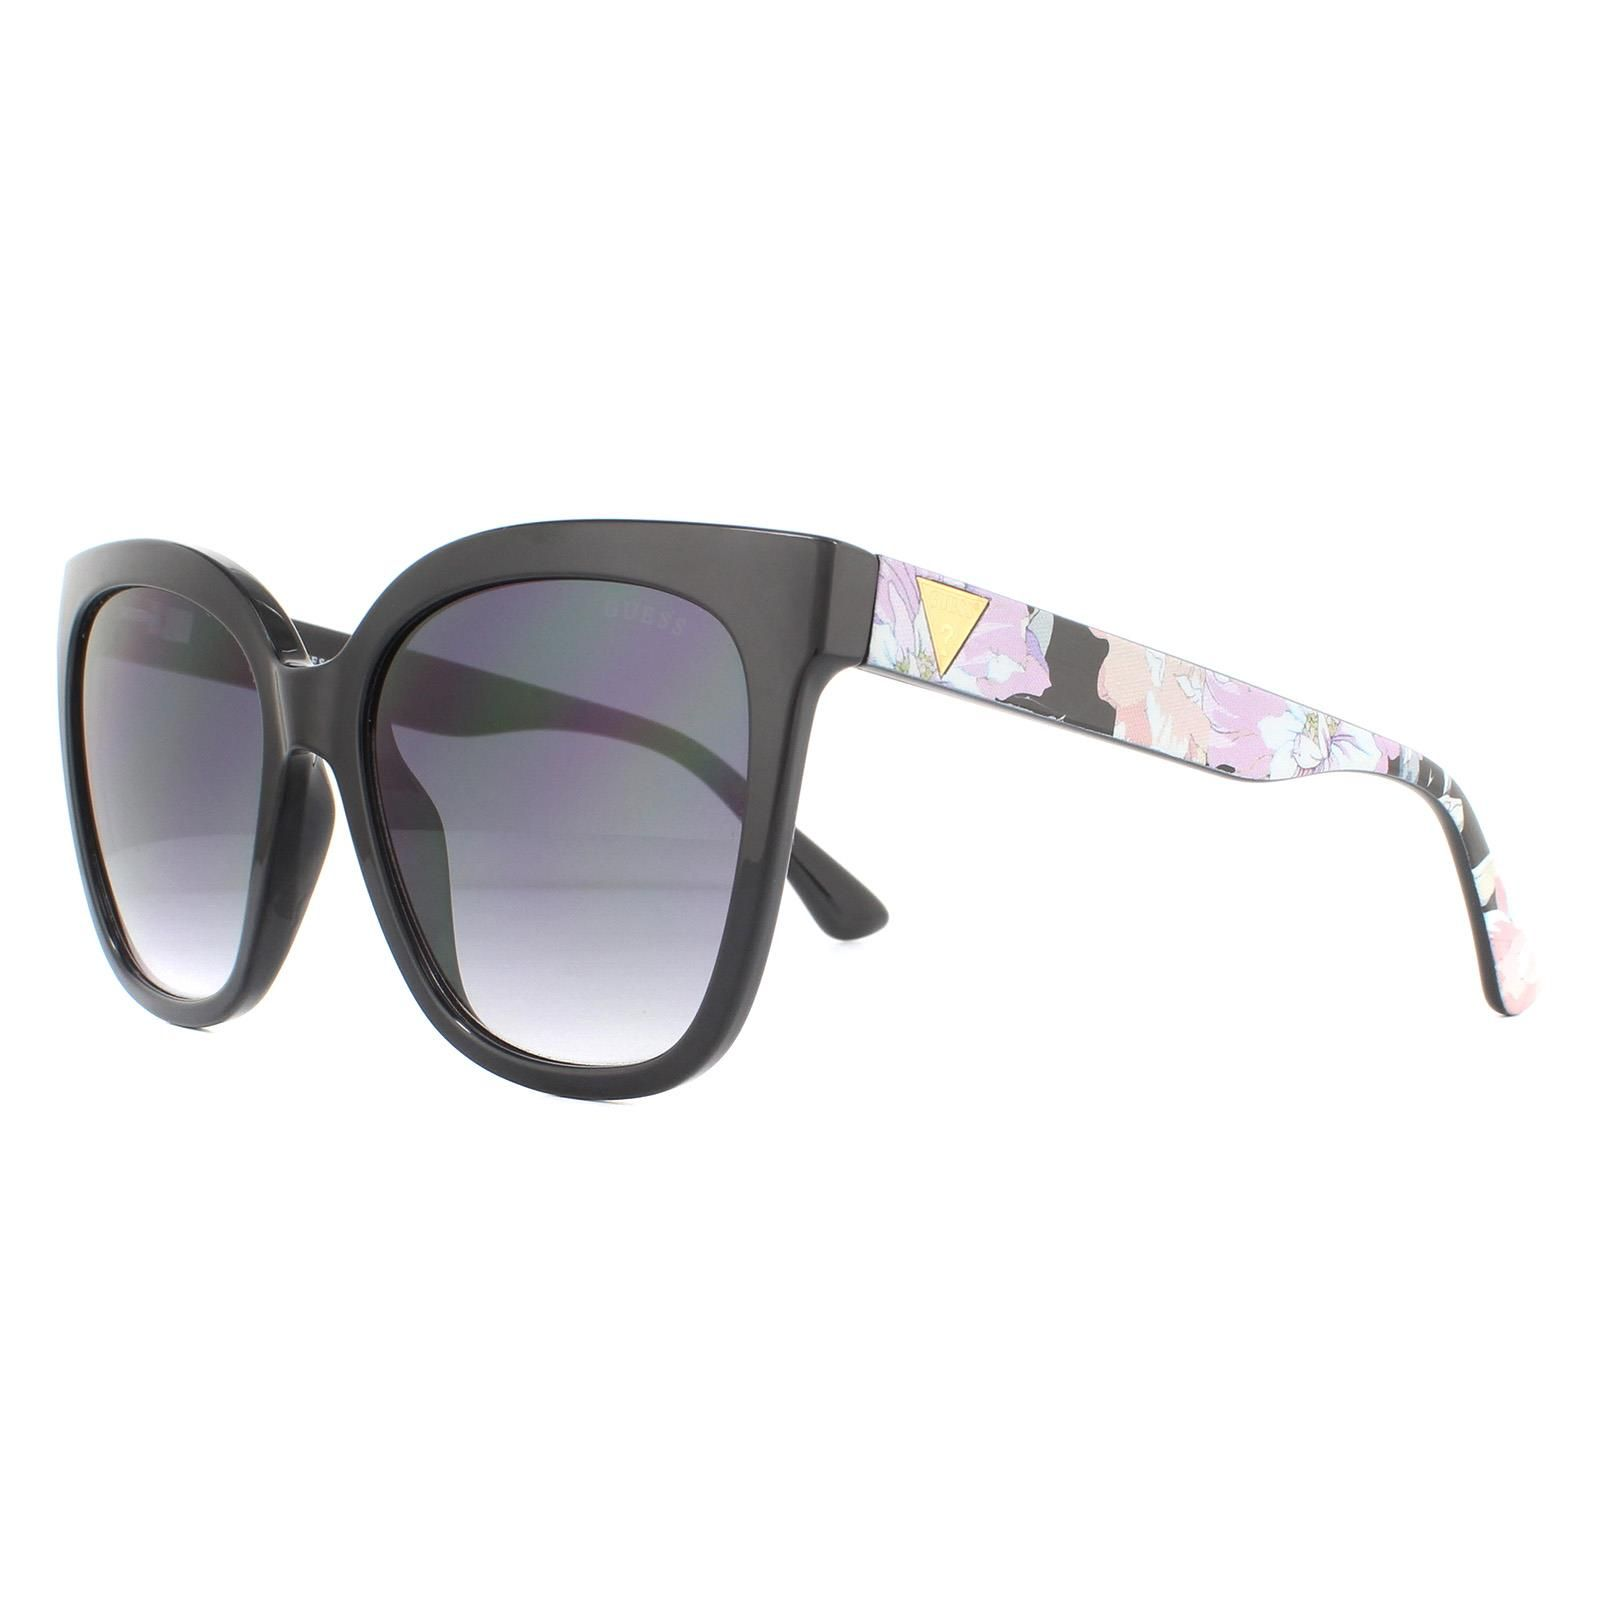 Guess Sunglasses GU7612 05B Black Pattern Grey Gradient